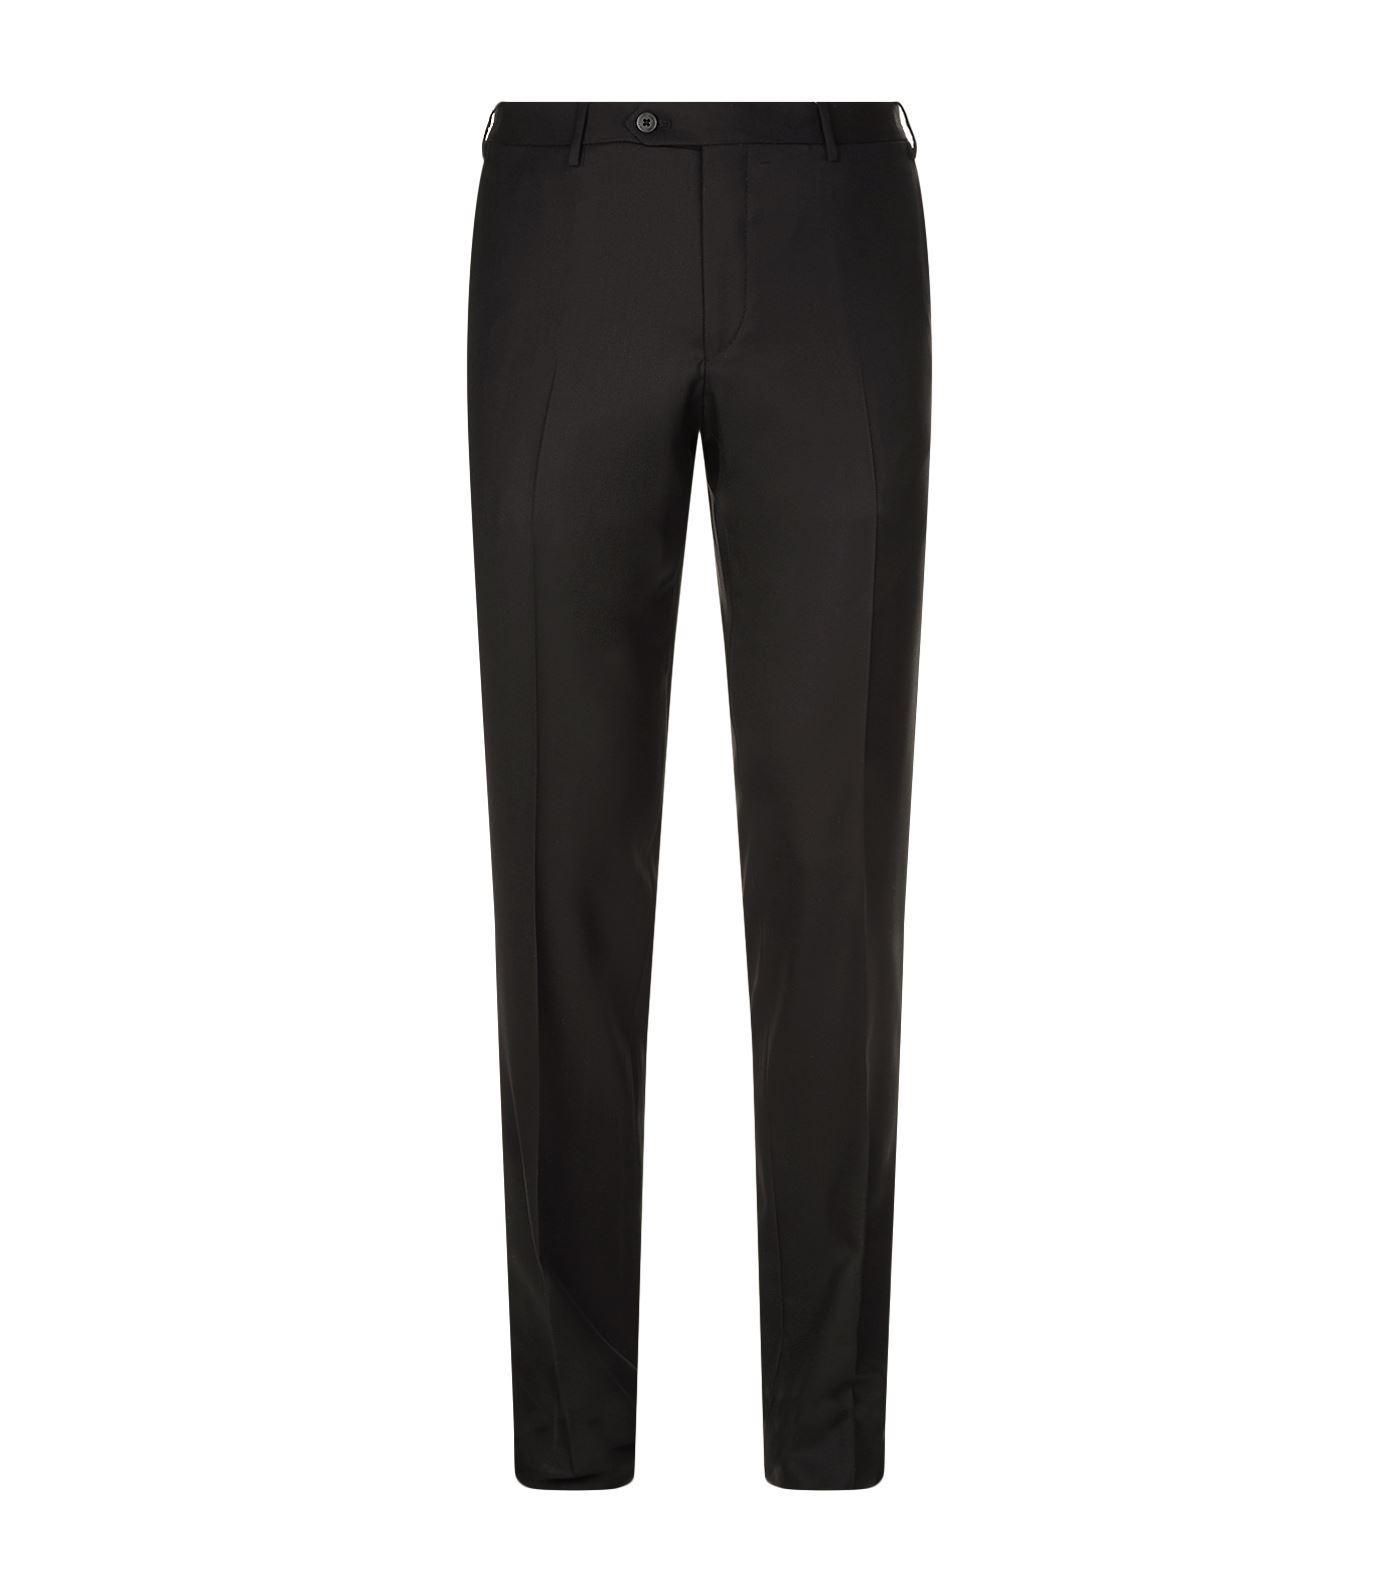 Corneliani Virgin Wool Trousers In Black